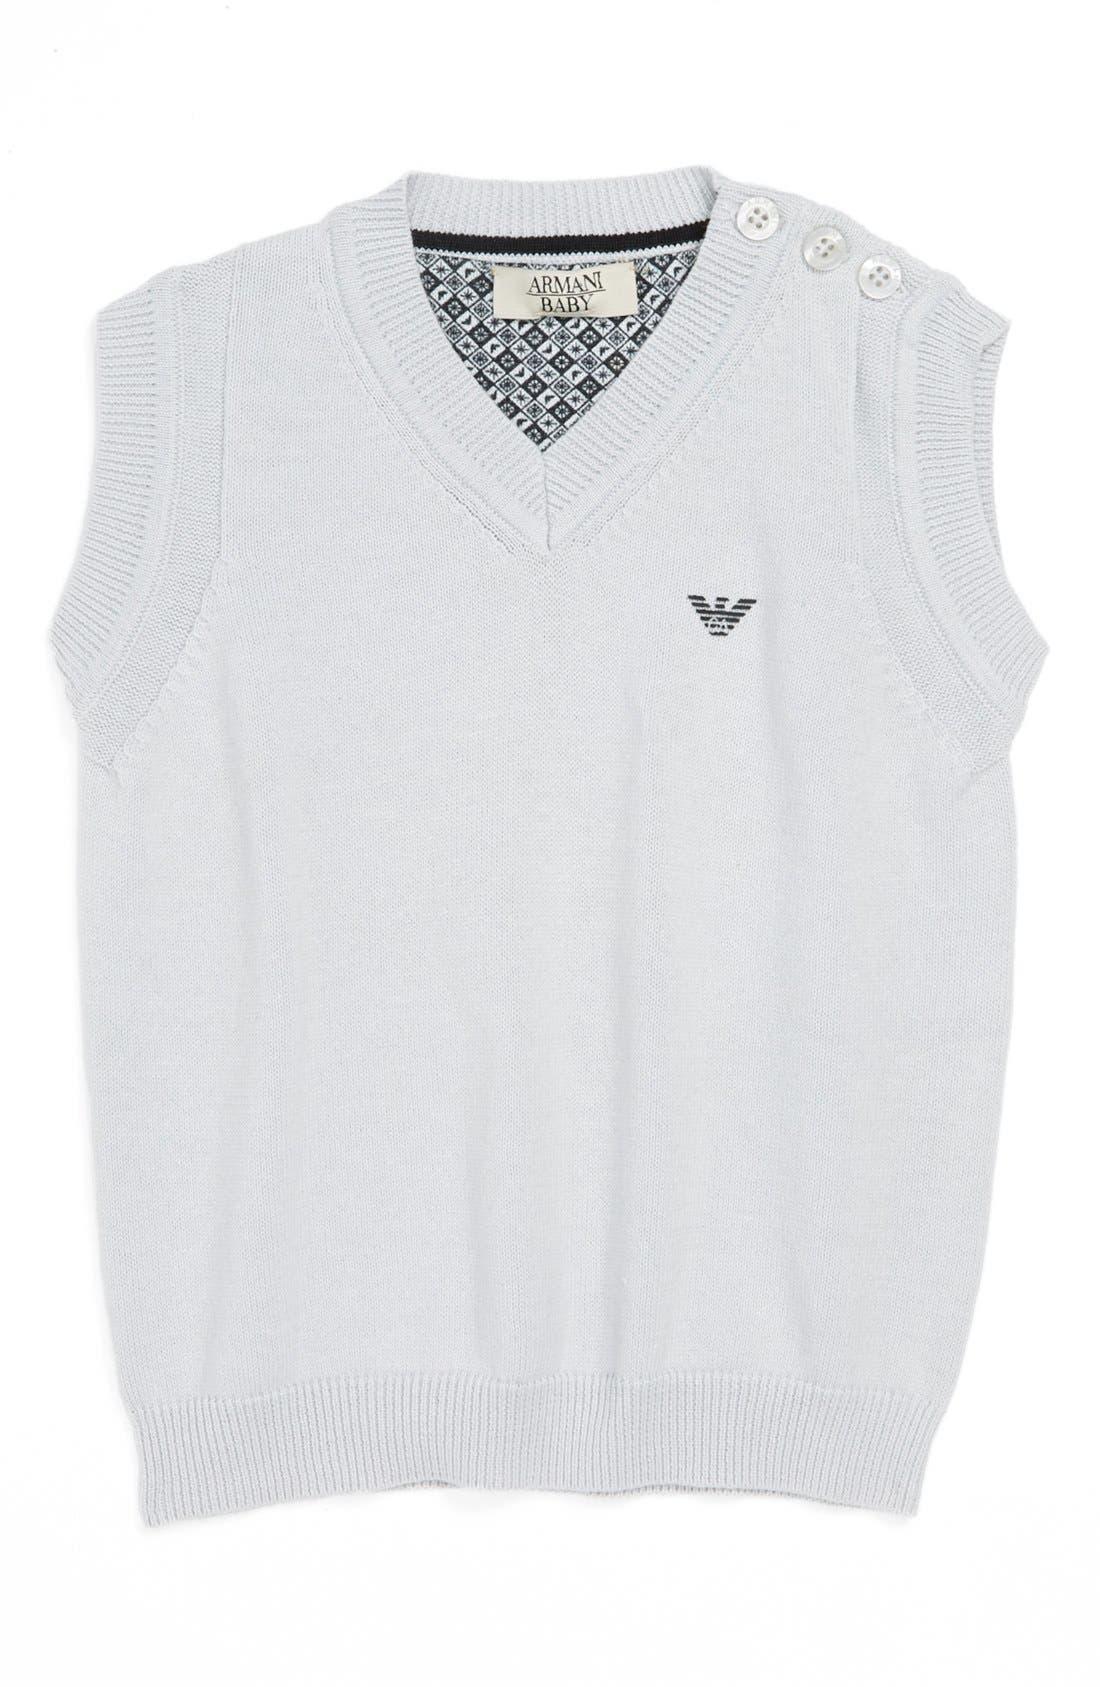 Main Image - Armani Junior Cotton Sweater Vest (Baby Boys)